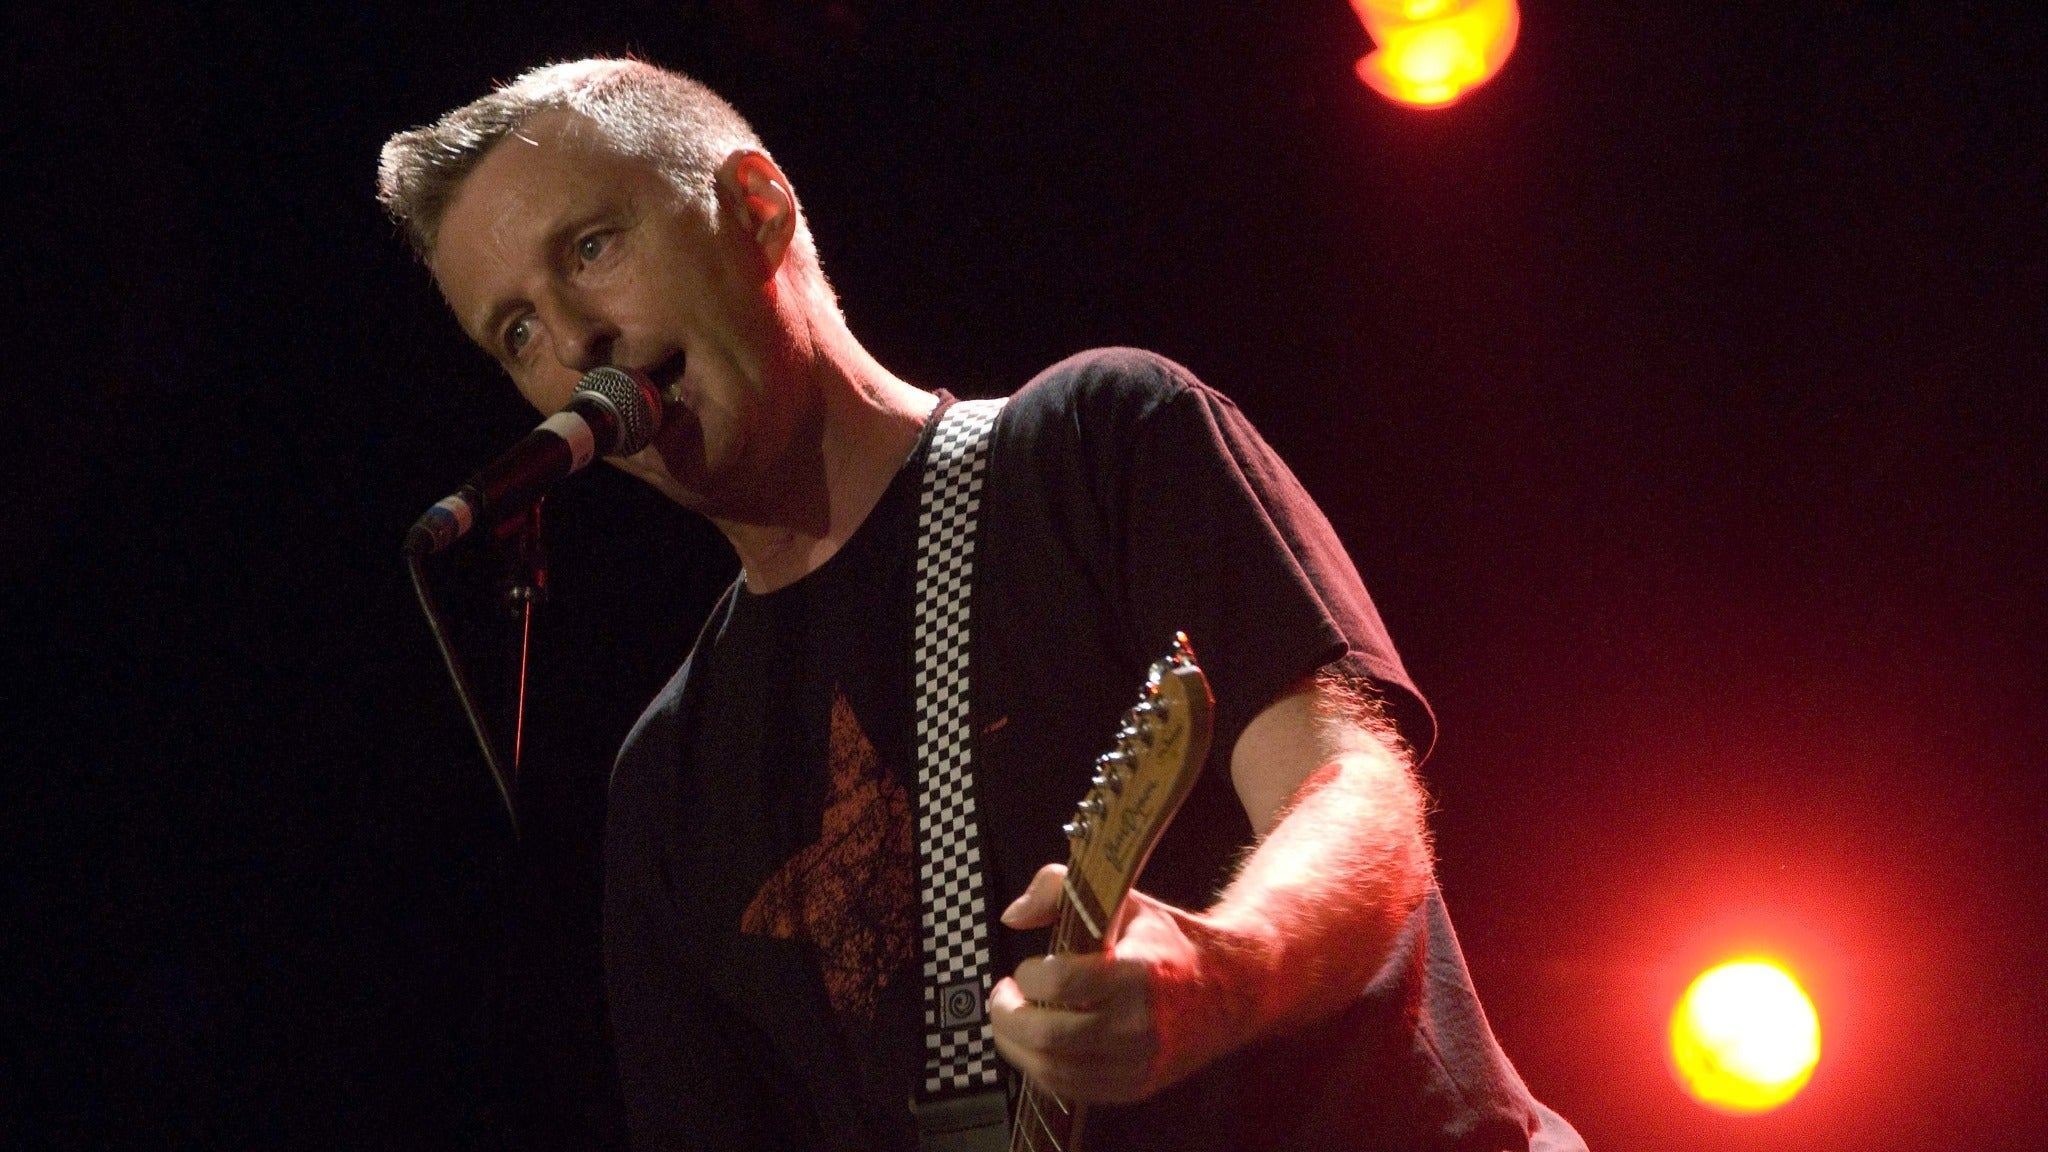 Billy Bragg + Joe Henry - Shine A Light Tour - Los Angeles, CA 90014